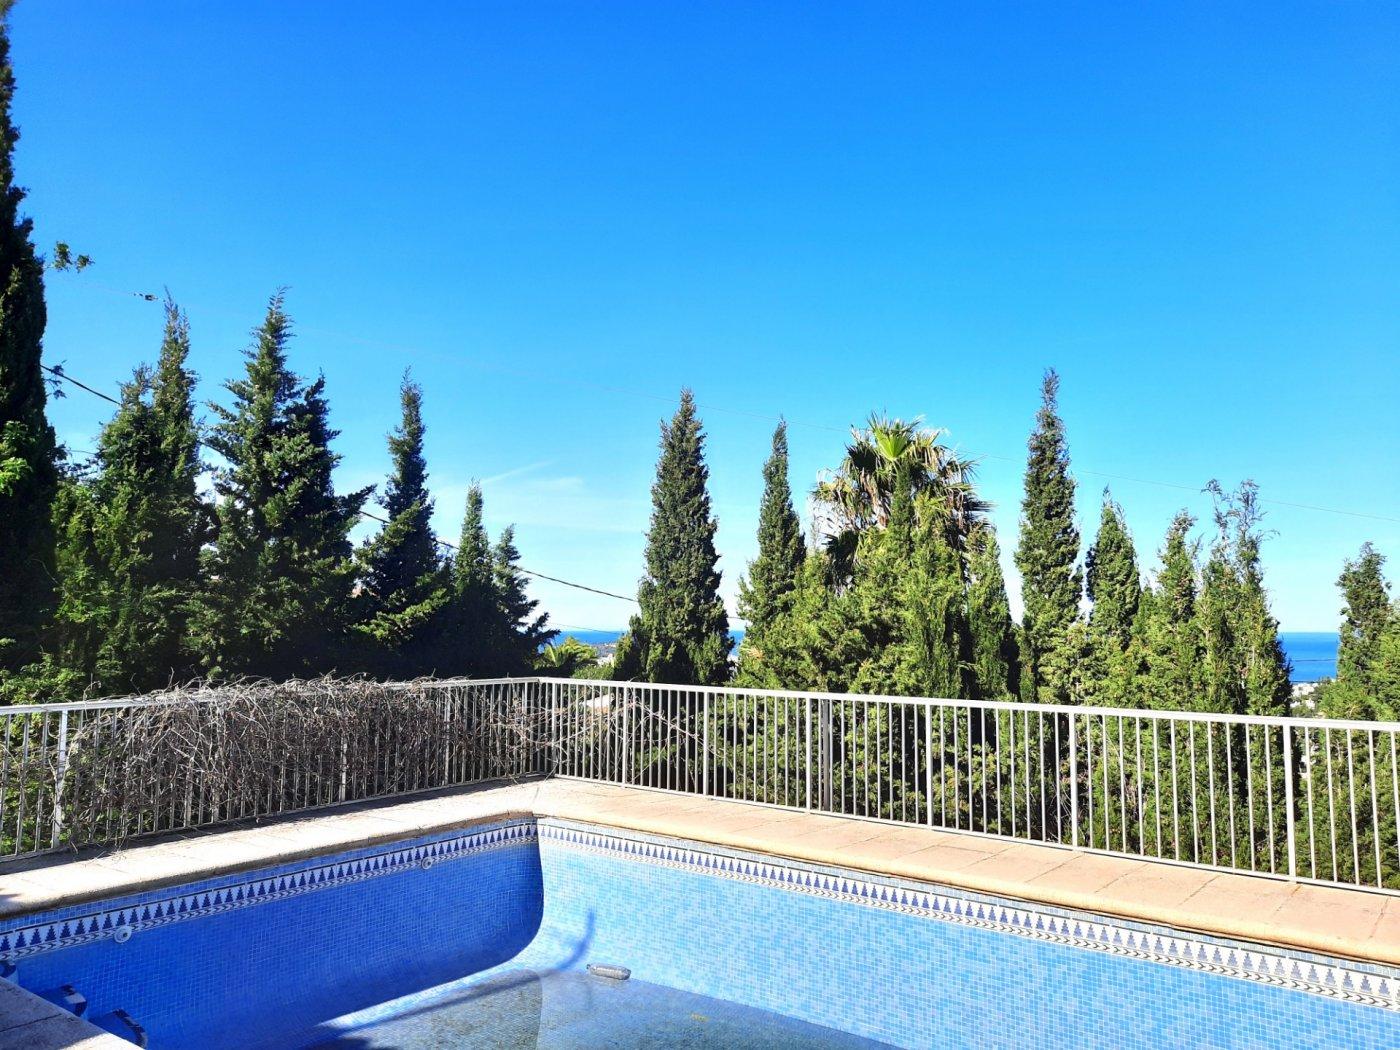 Chalet con piscina en denia - imagenInmueble11